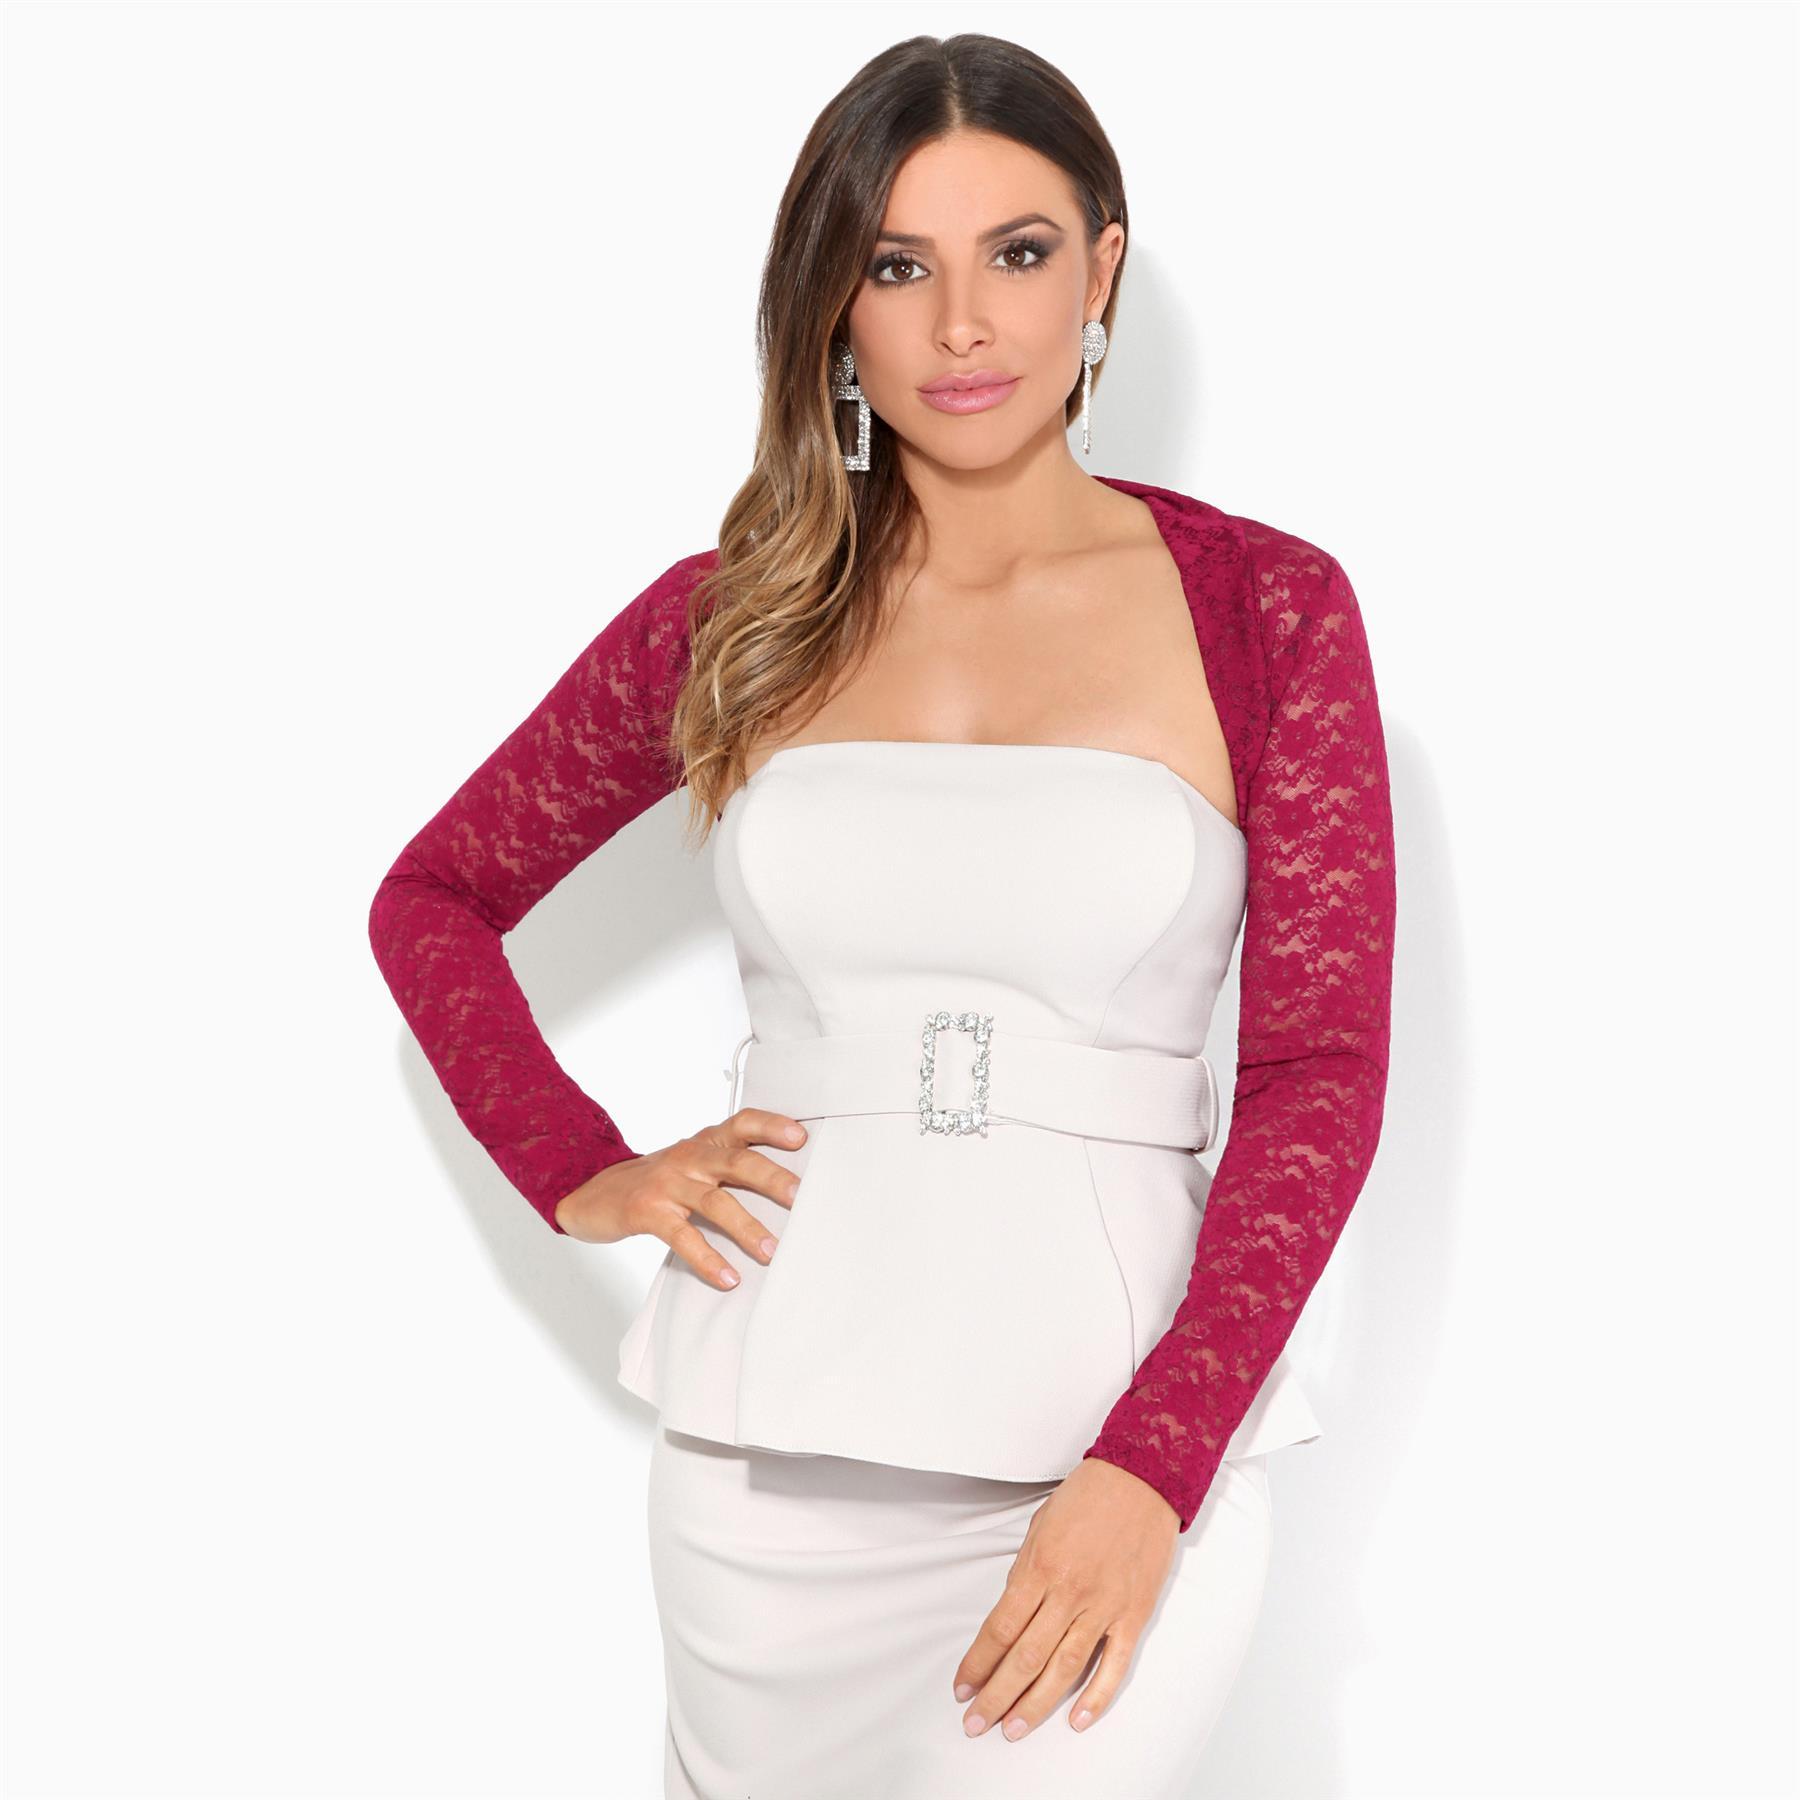 Details zu KRISP Damen Bolero Jacke Cardigan Festliches Jäckchen Elegante Schulterjacke Neu